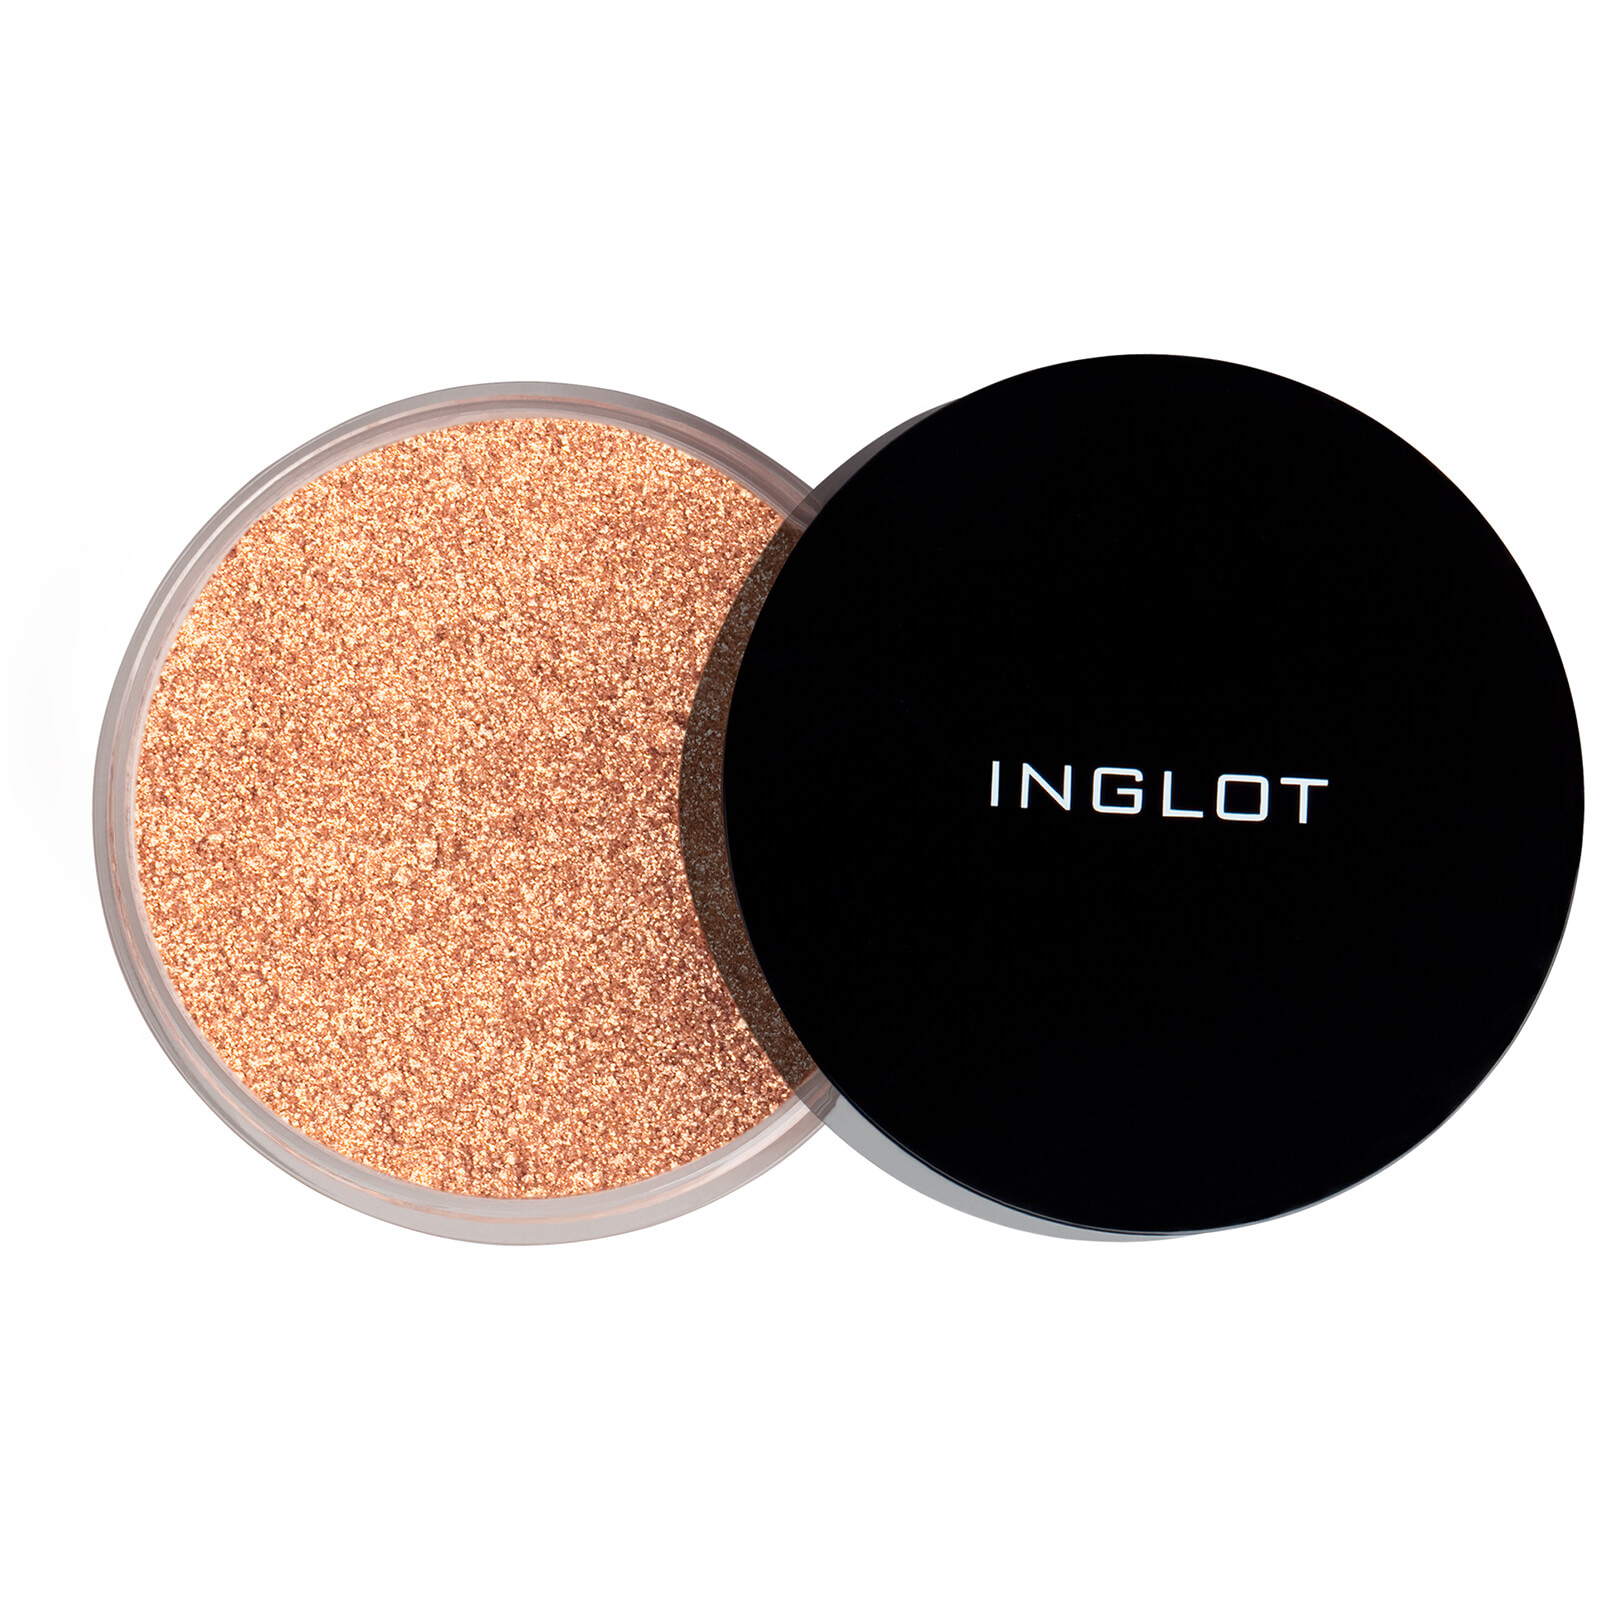 Купить Inglot Sparkling Dust Feb 5g (Various Shades) - 2